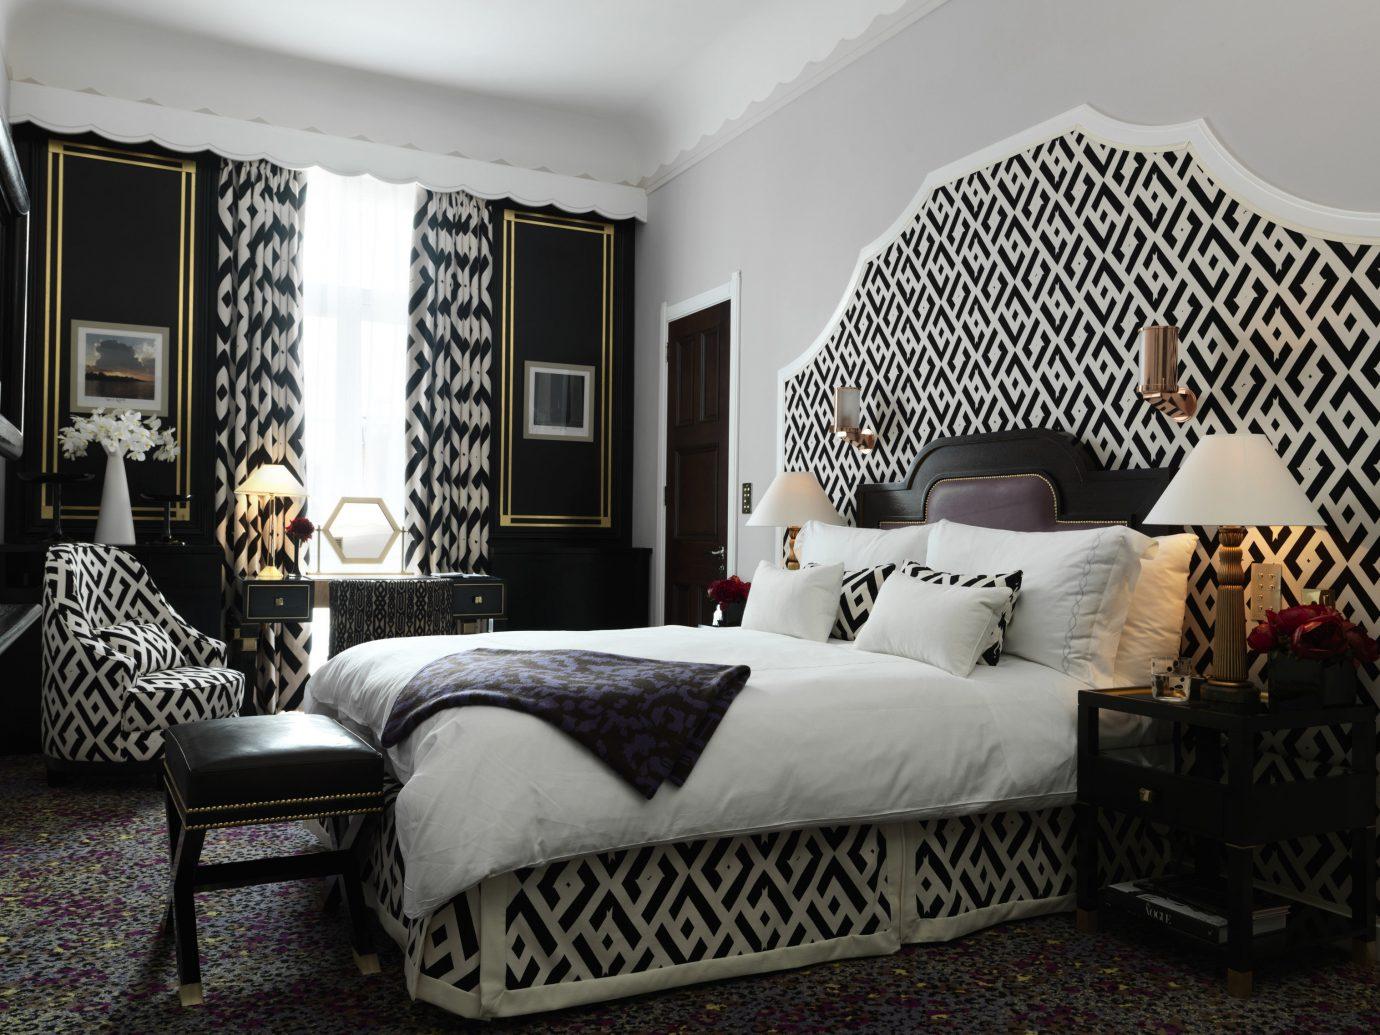 Bedroom at Claridge's, London